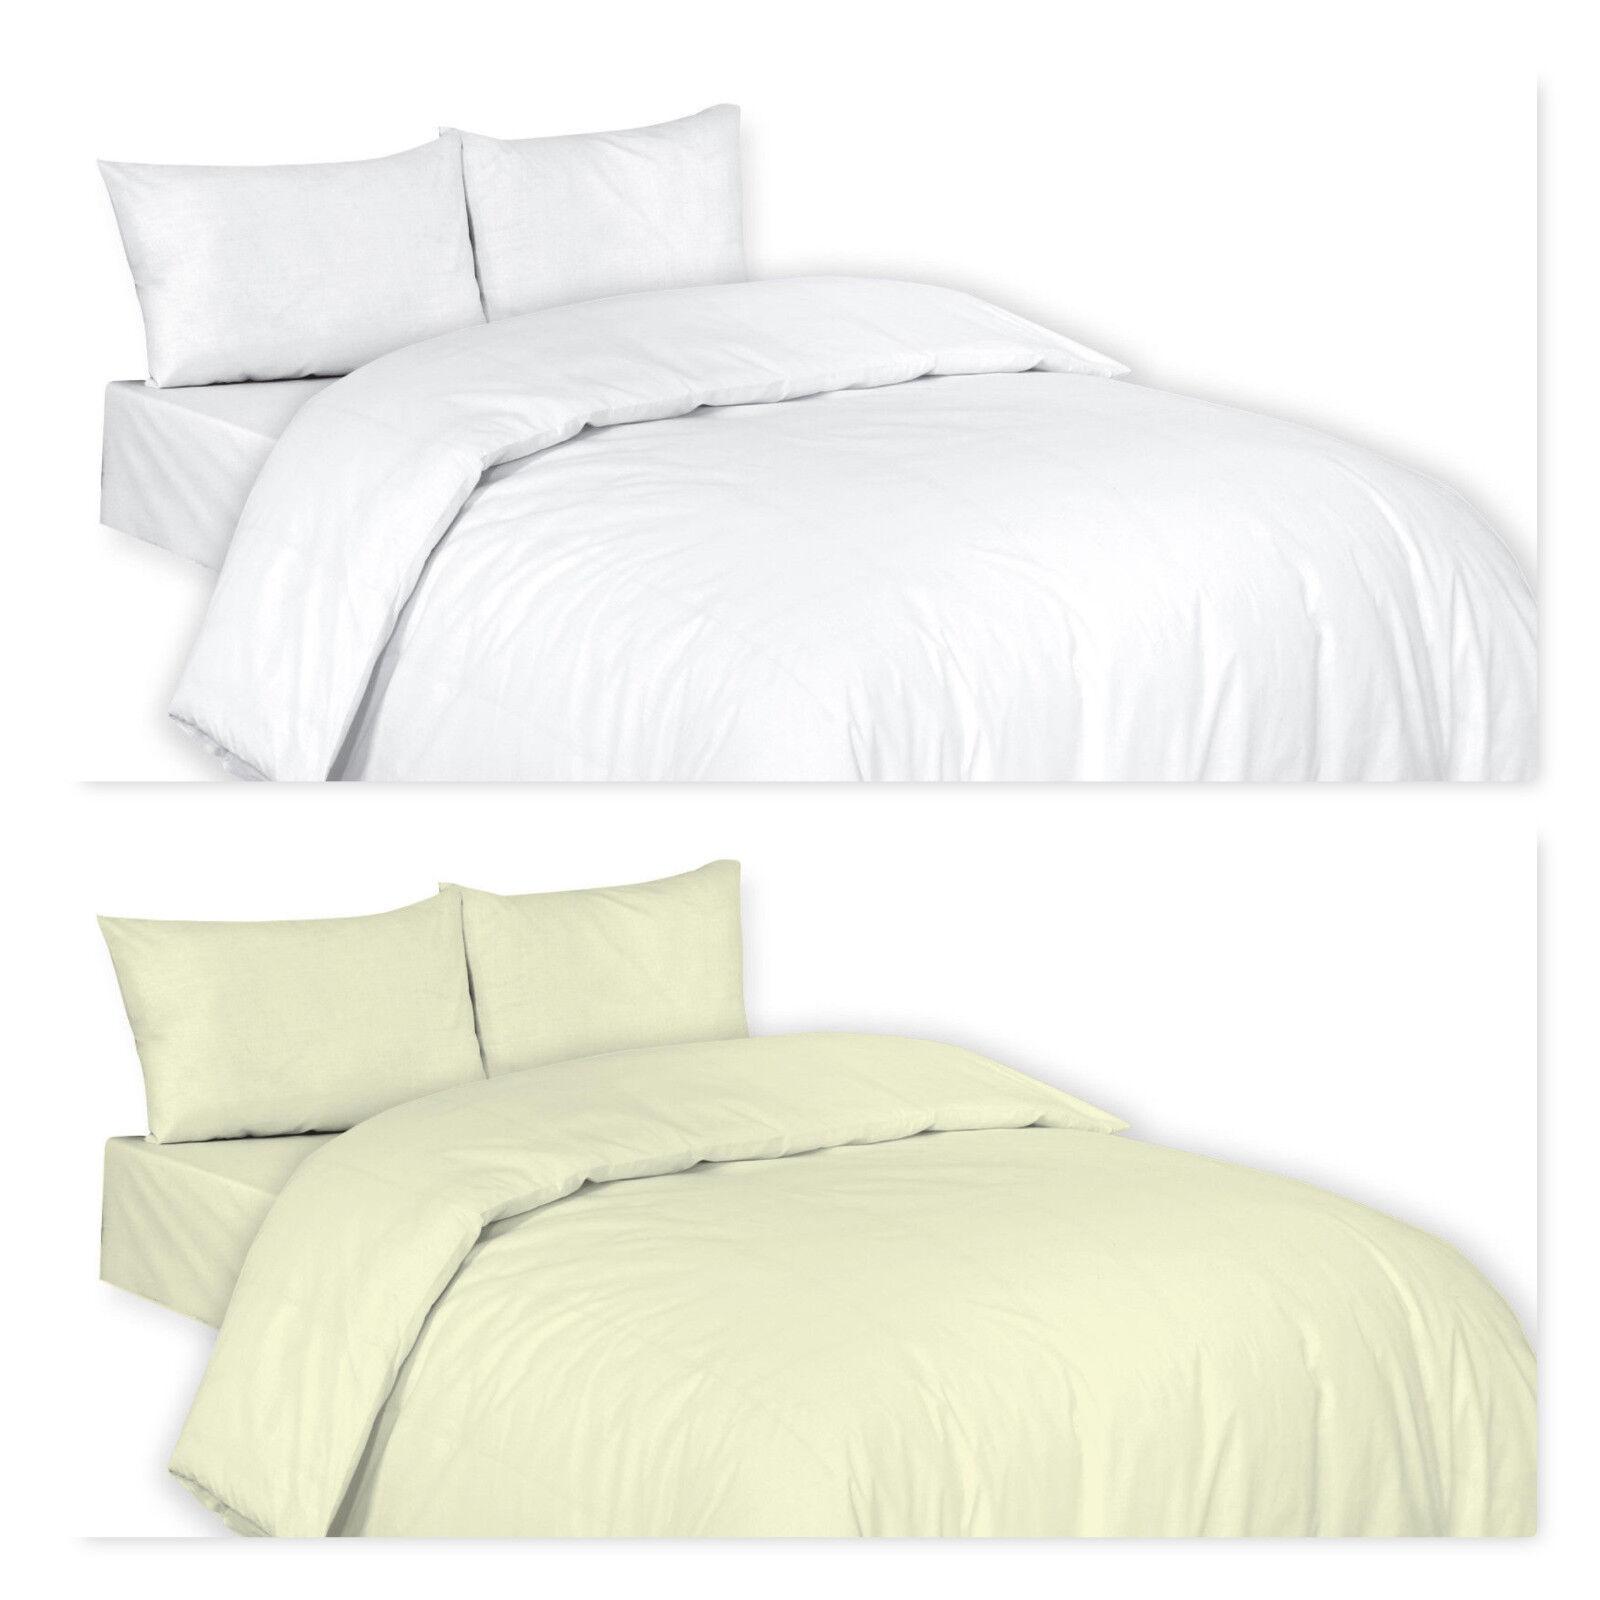 Luxury TC800 100% Egyptian Cotton Duvet Quilt Cover Bedding Set Best Quality